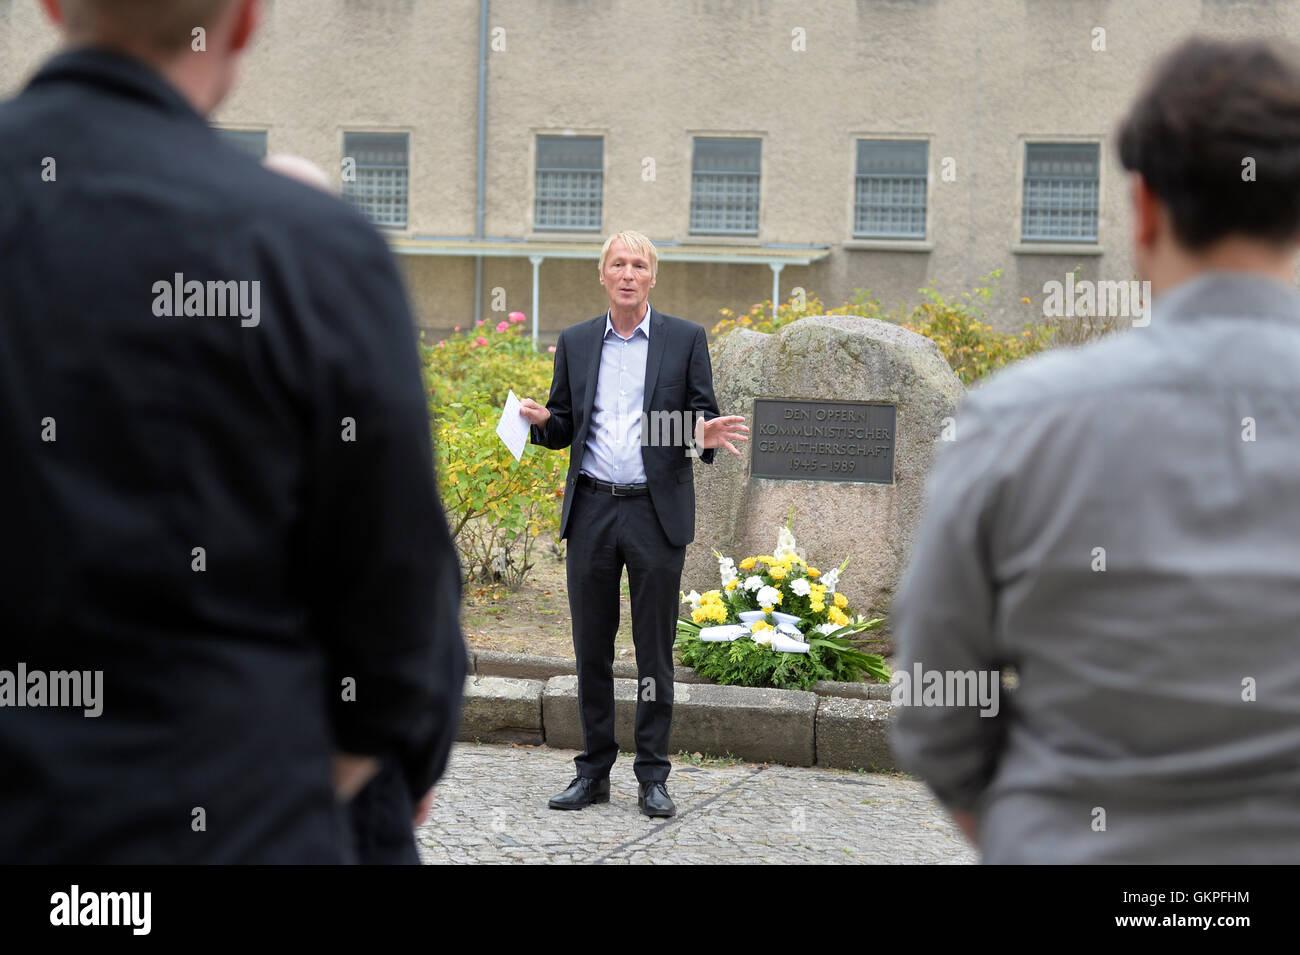 Berlin, Germany. 23rd Aug, 2016. Hubertus Knabe, director of the Stasi prison memorial site Berlin-Hohenschoenhausen, - Stock Image